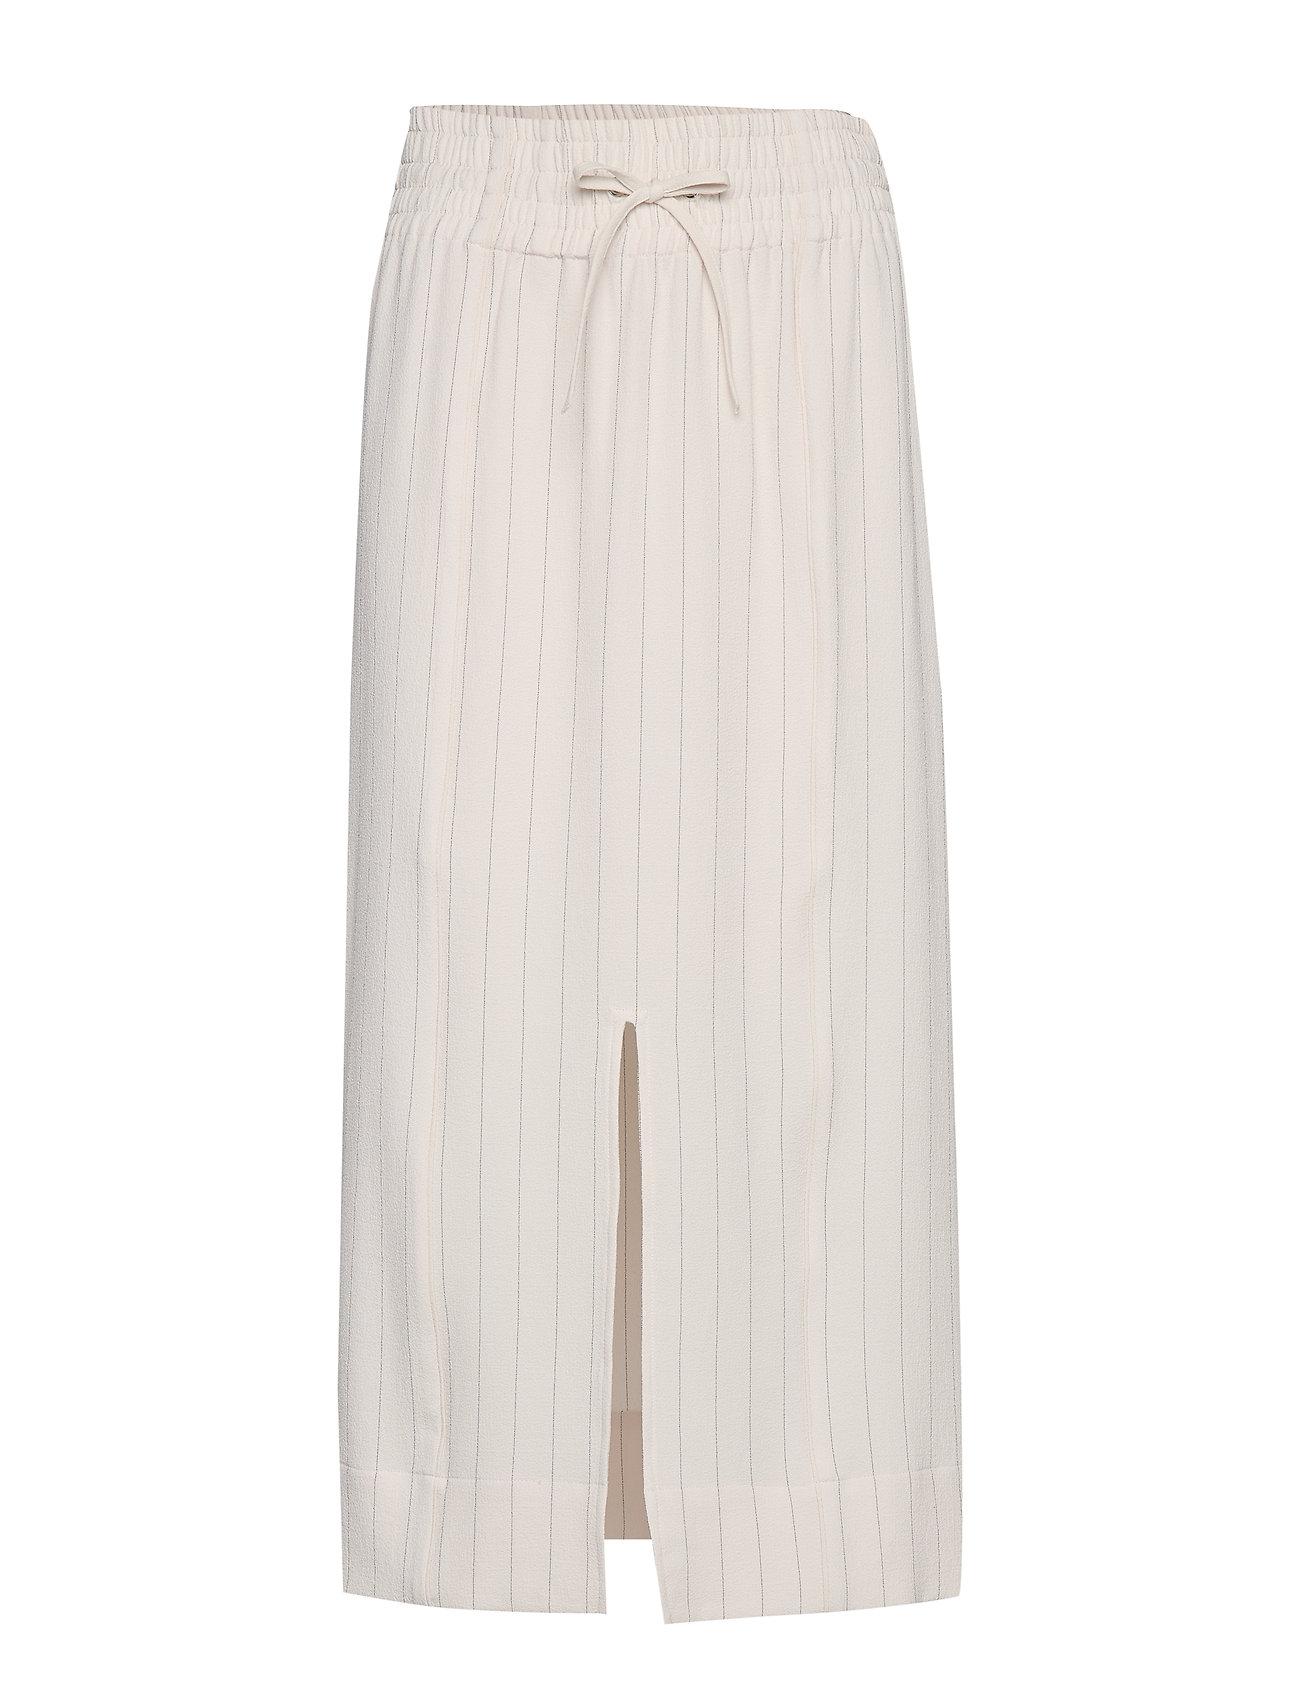 Ganni Heavy Crepe Skirt - TAPIOCA